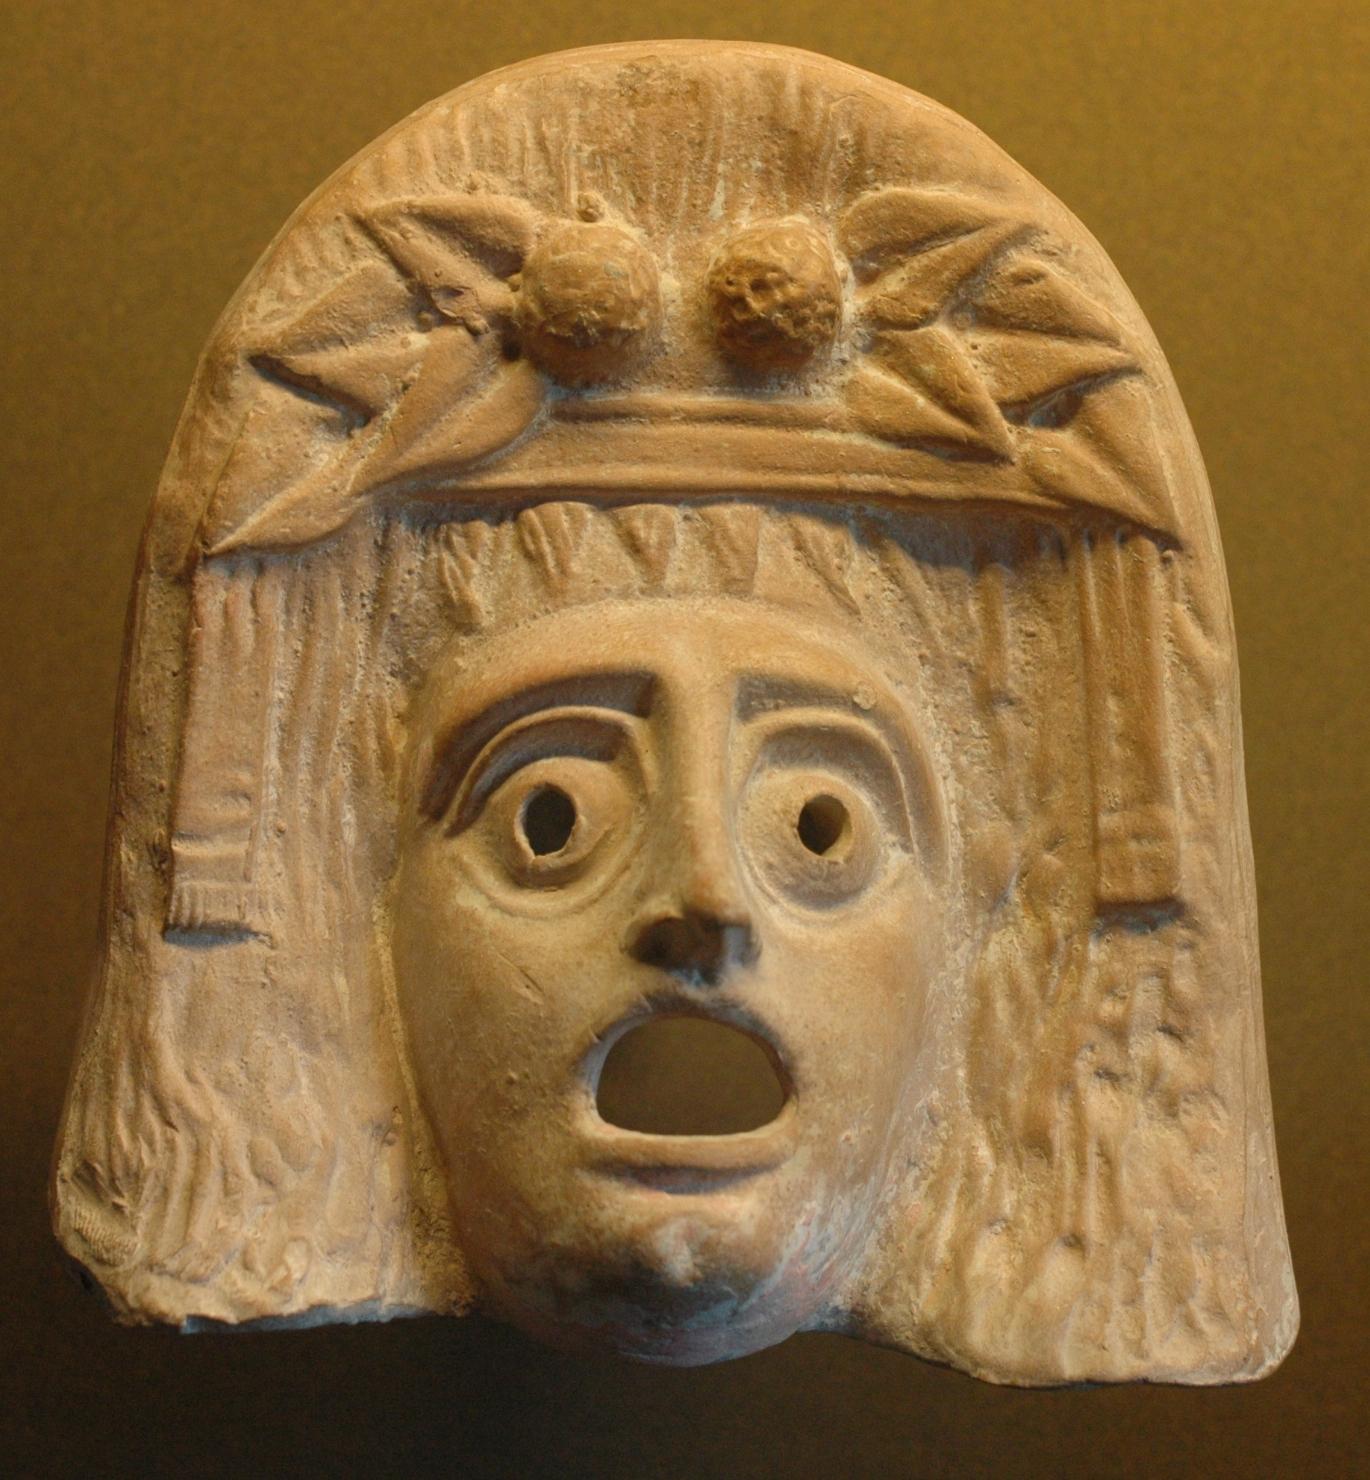 Theatermasker dat Dionysos voorstelt